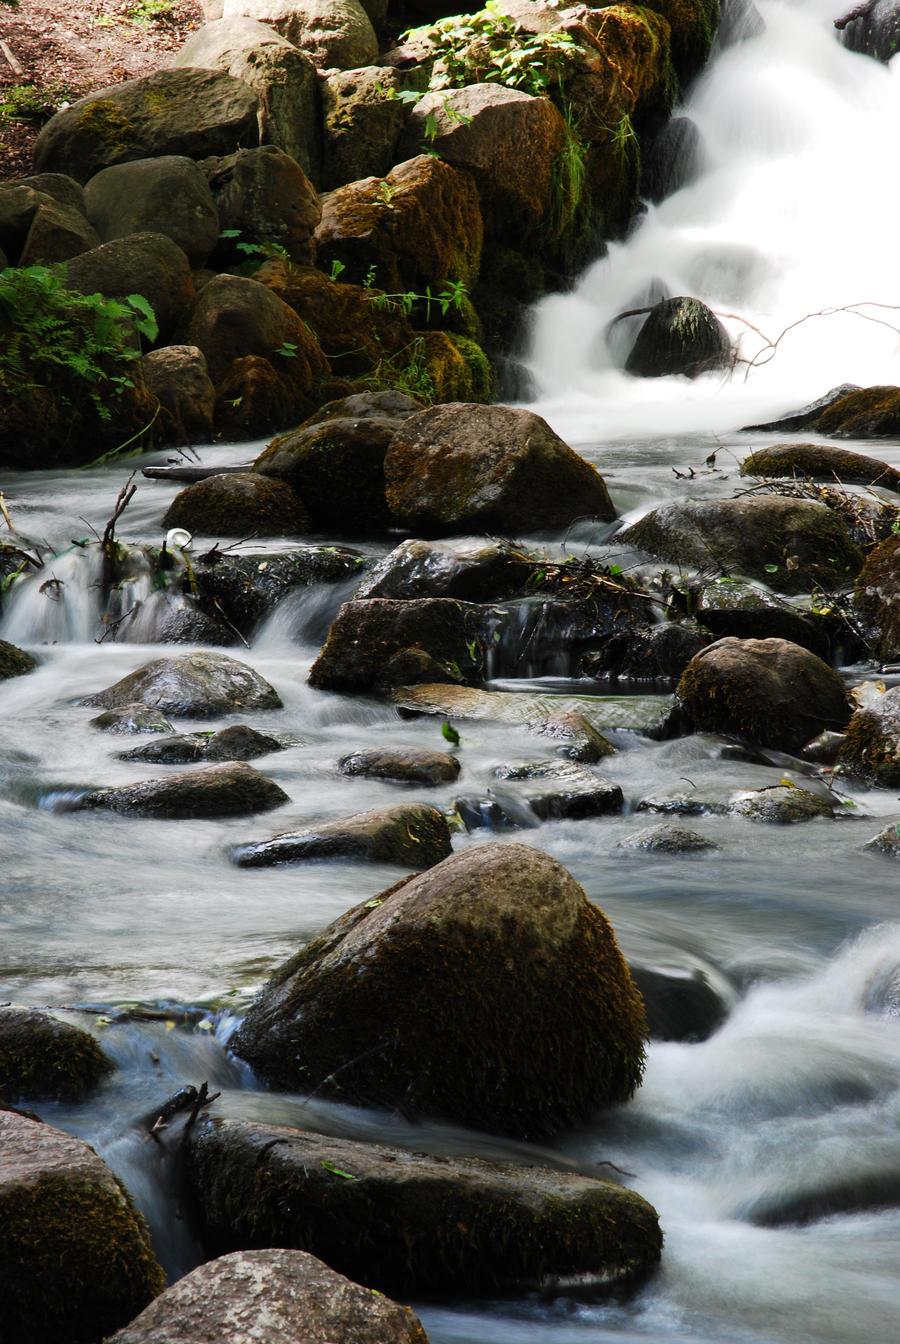 Waterfall and rocks by iisjahstock